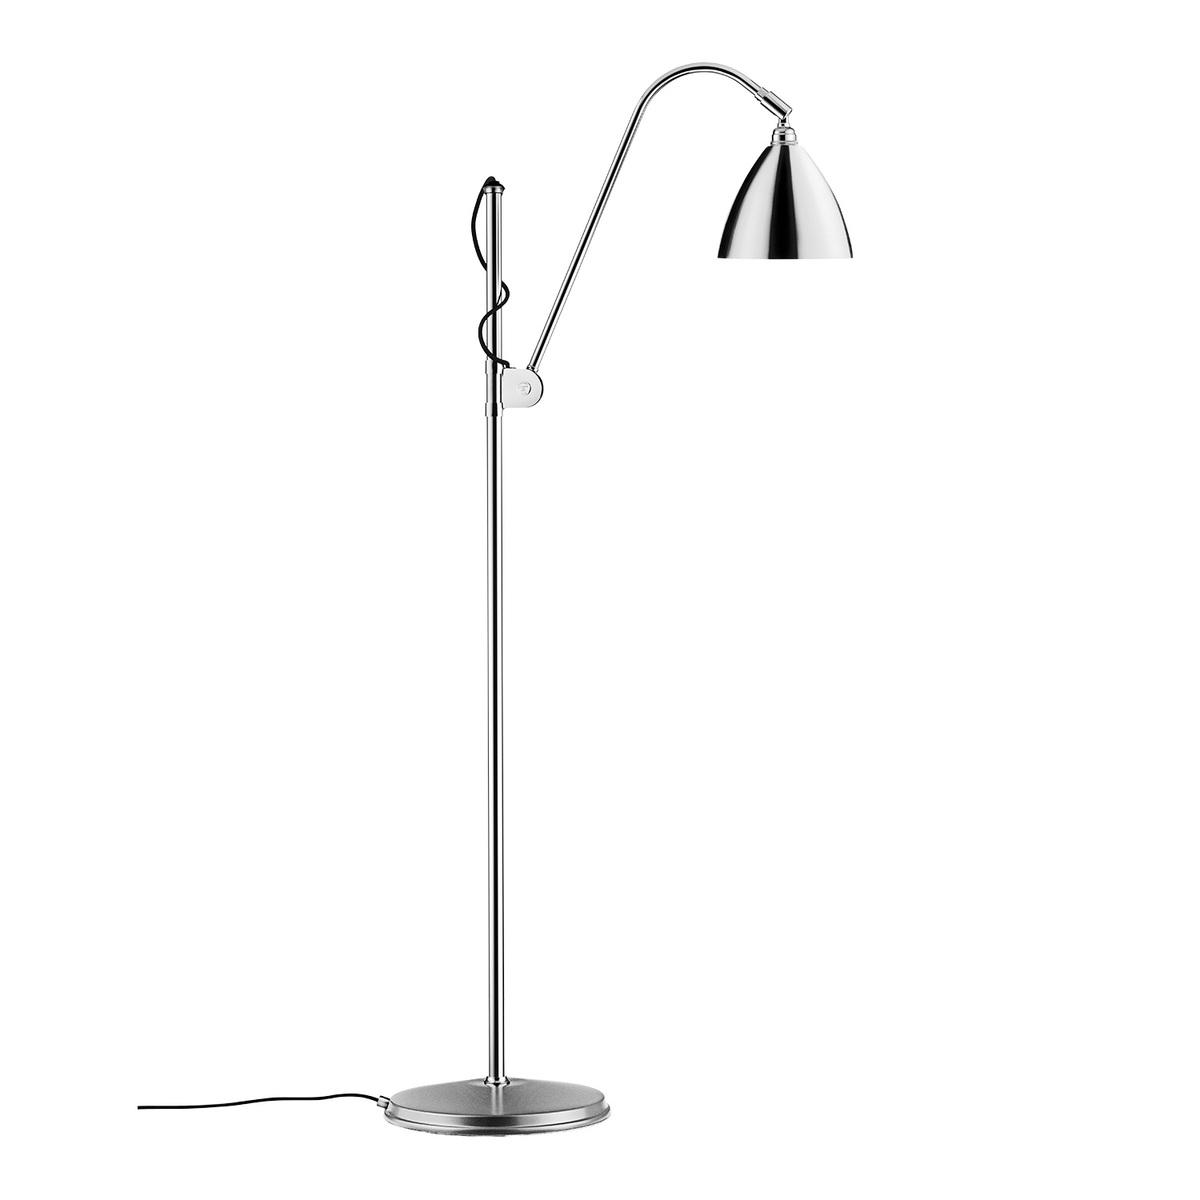 Bestlite Bl3 Floor Lamp S Chrome regarding proportions 1200 X 1200